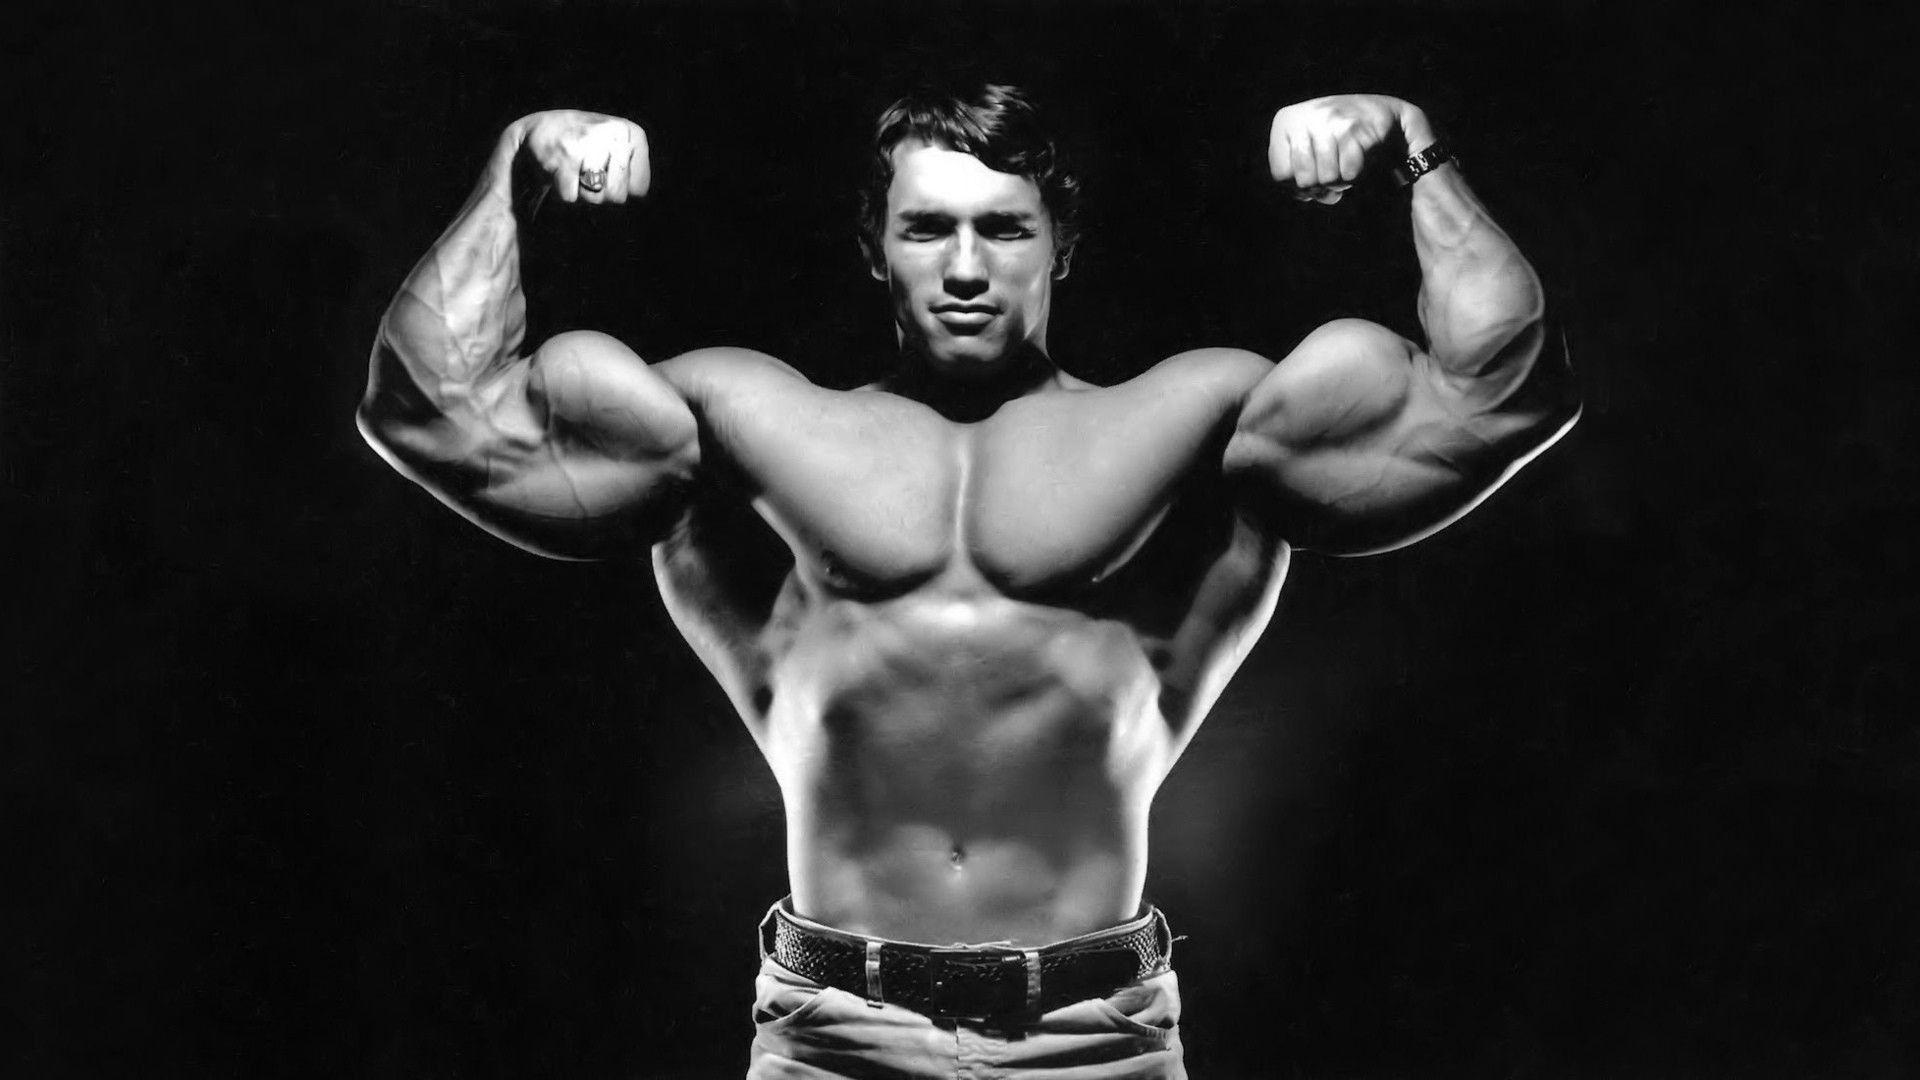 Arnold Schwarzenegger Wallpapers Top Free Arnold